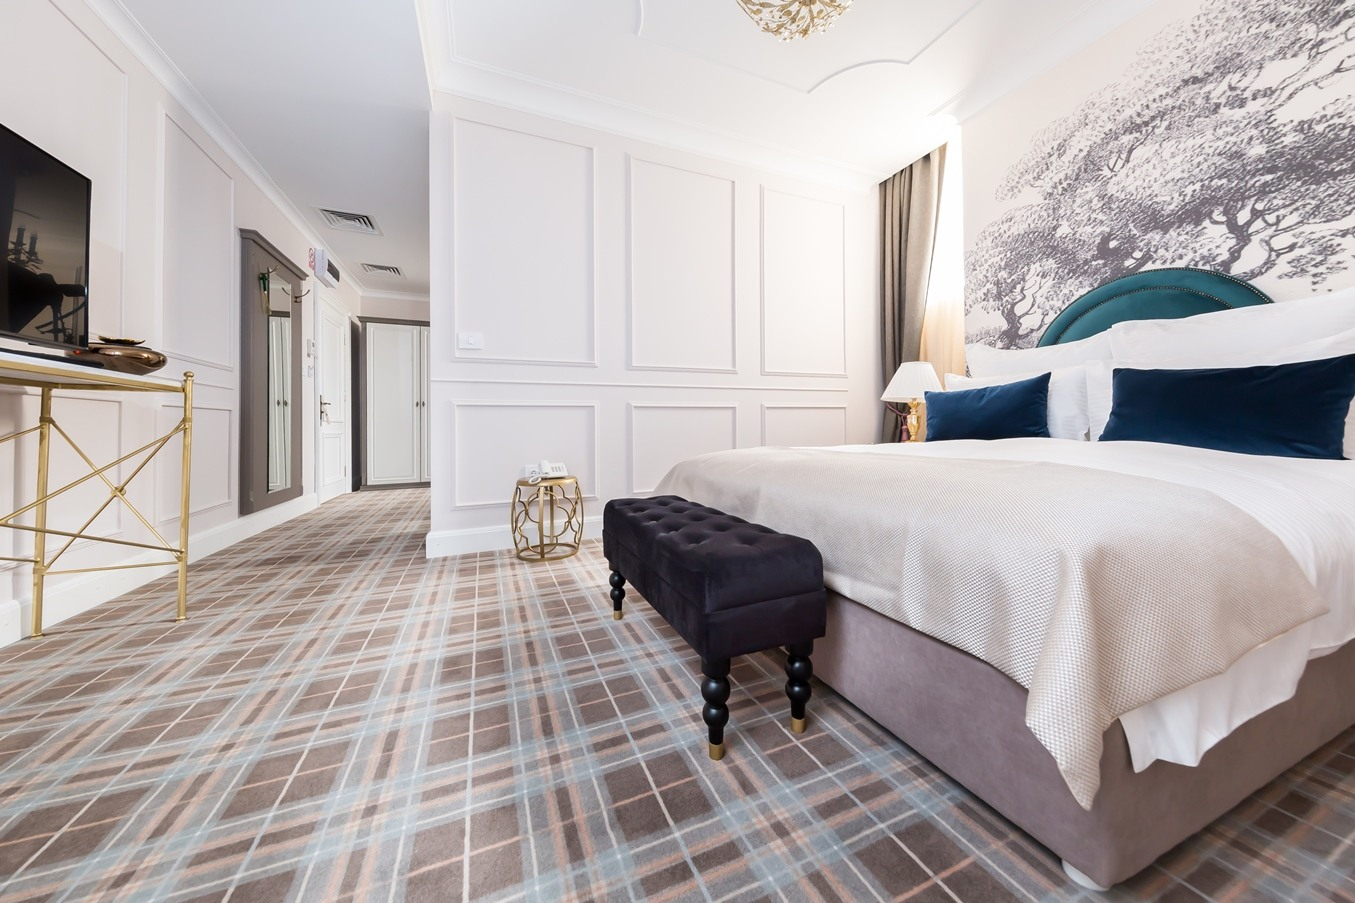 Apartament Model Special Hotel Splendid – Craiova – 2